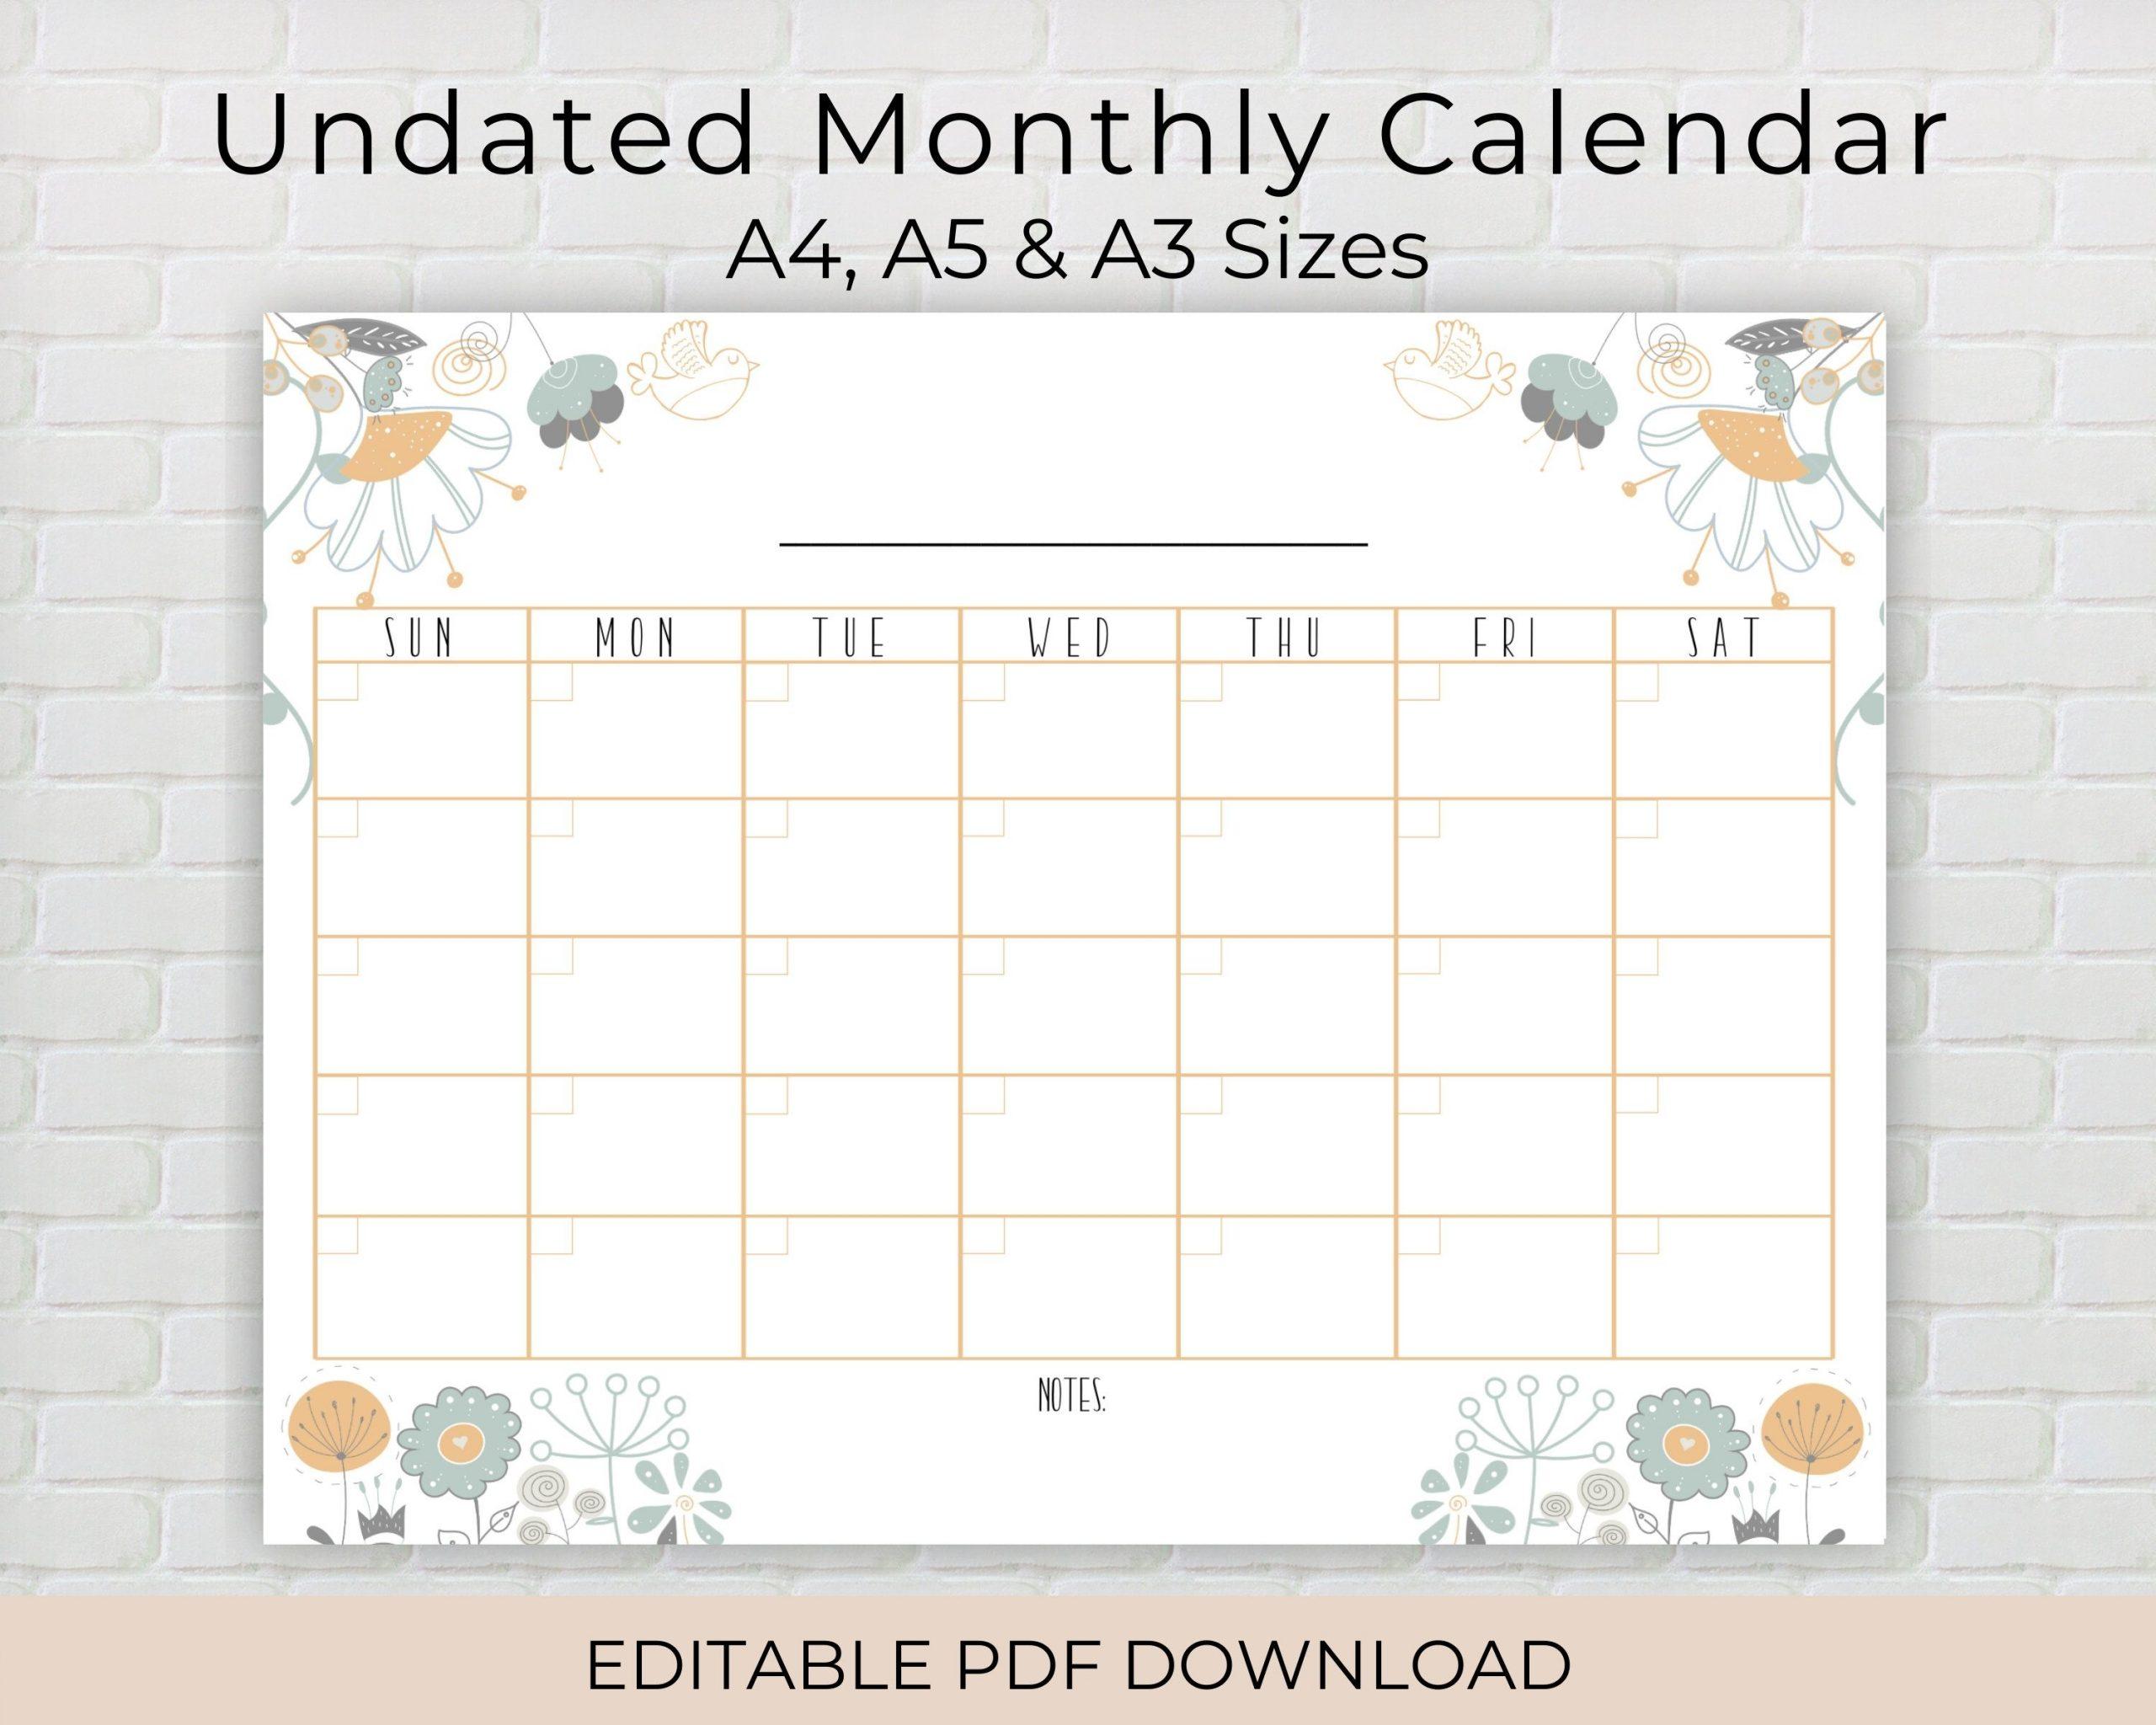 Undated Editable Monthly Calendar Printable Planner Pdf